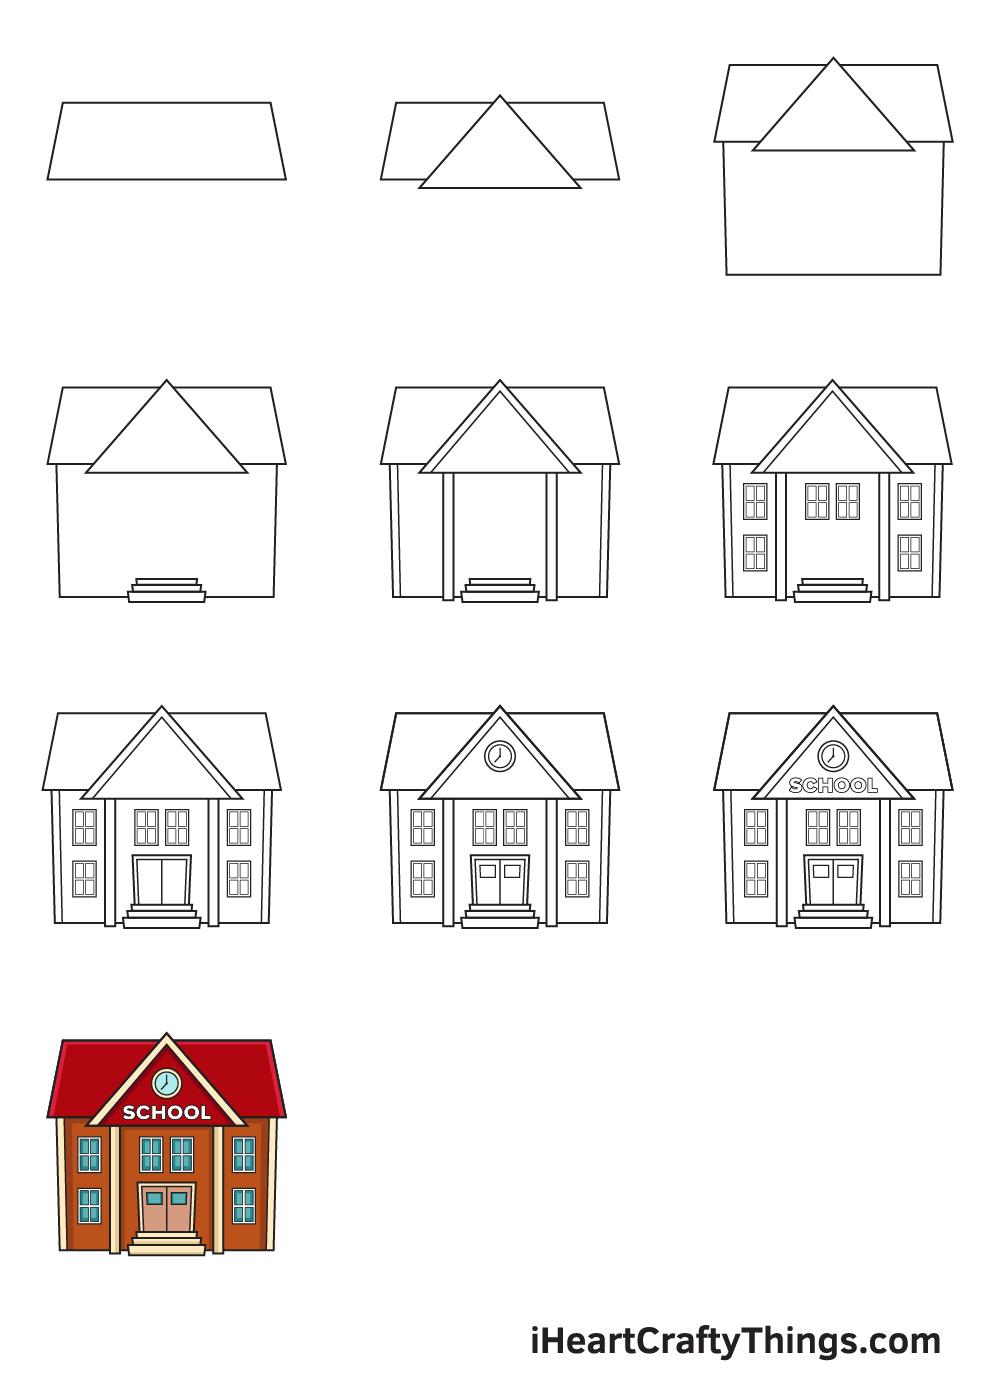 drawing school in 9 steps